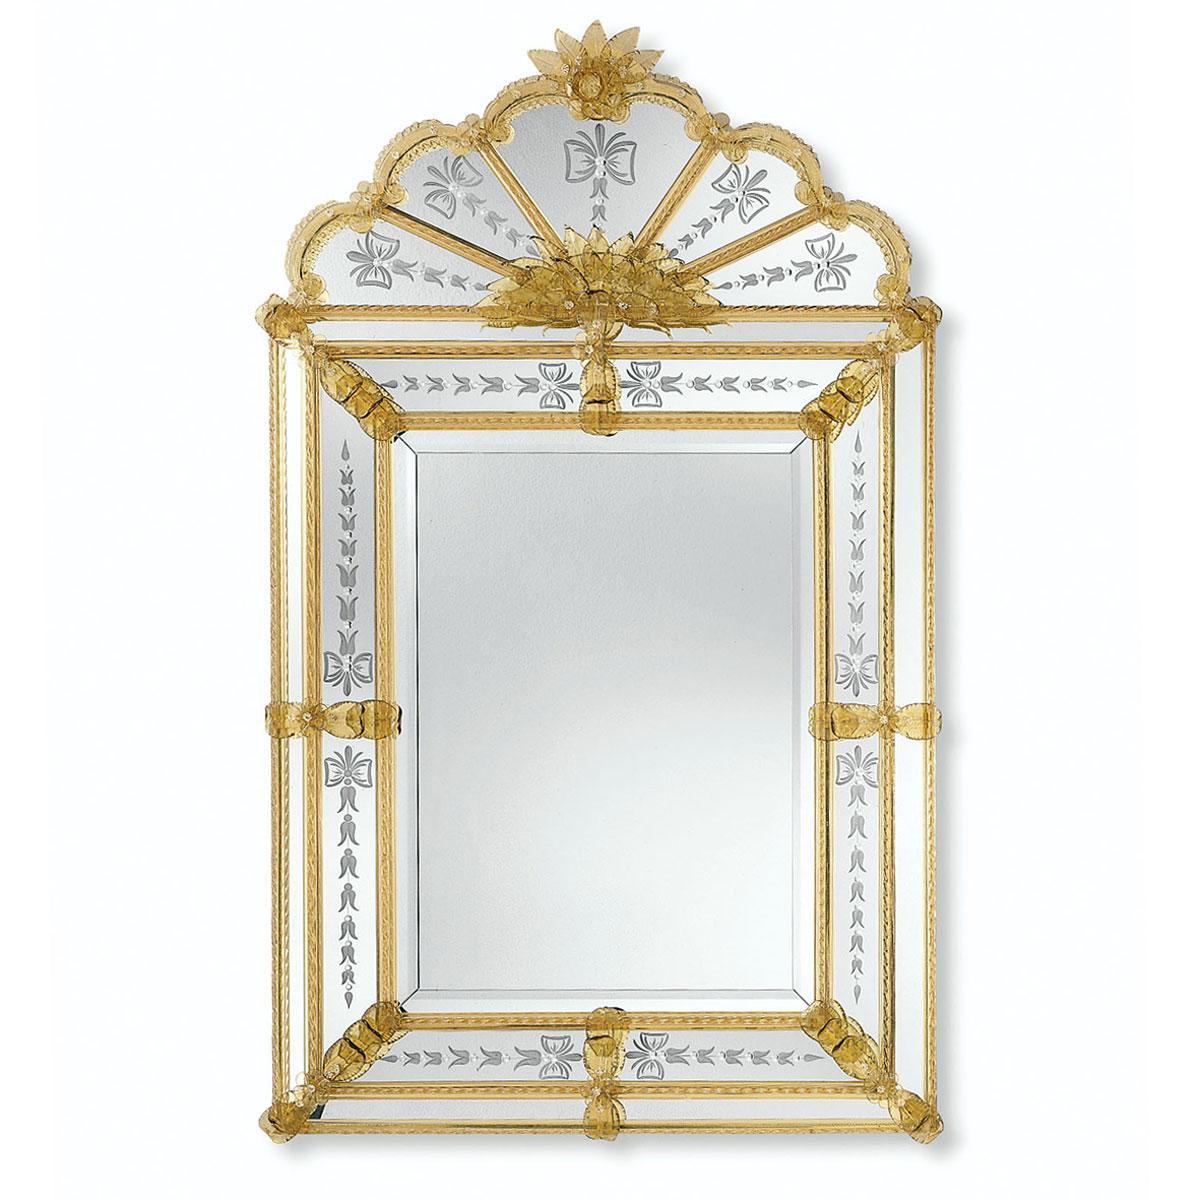 """Bernadetta"" Murano glas venezianischen spiegel"